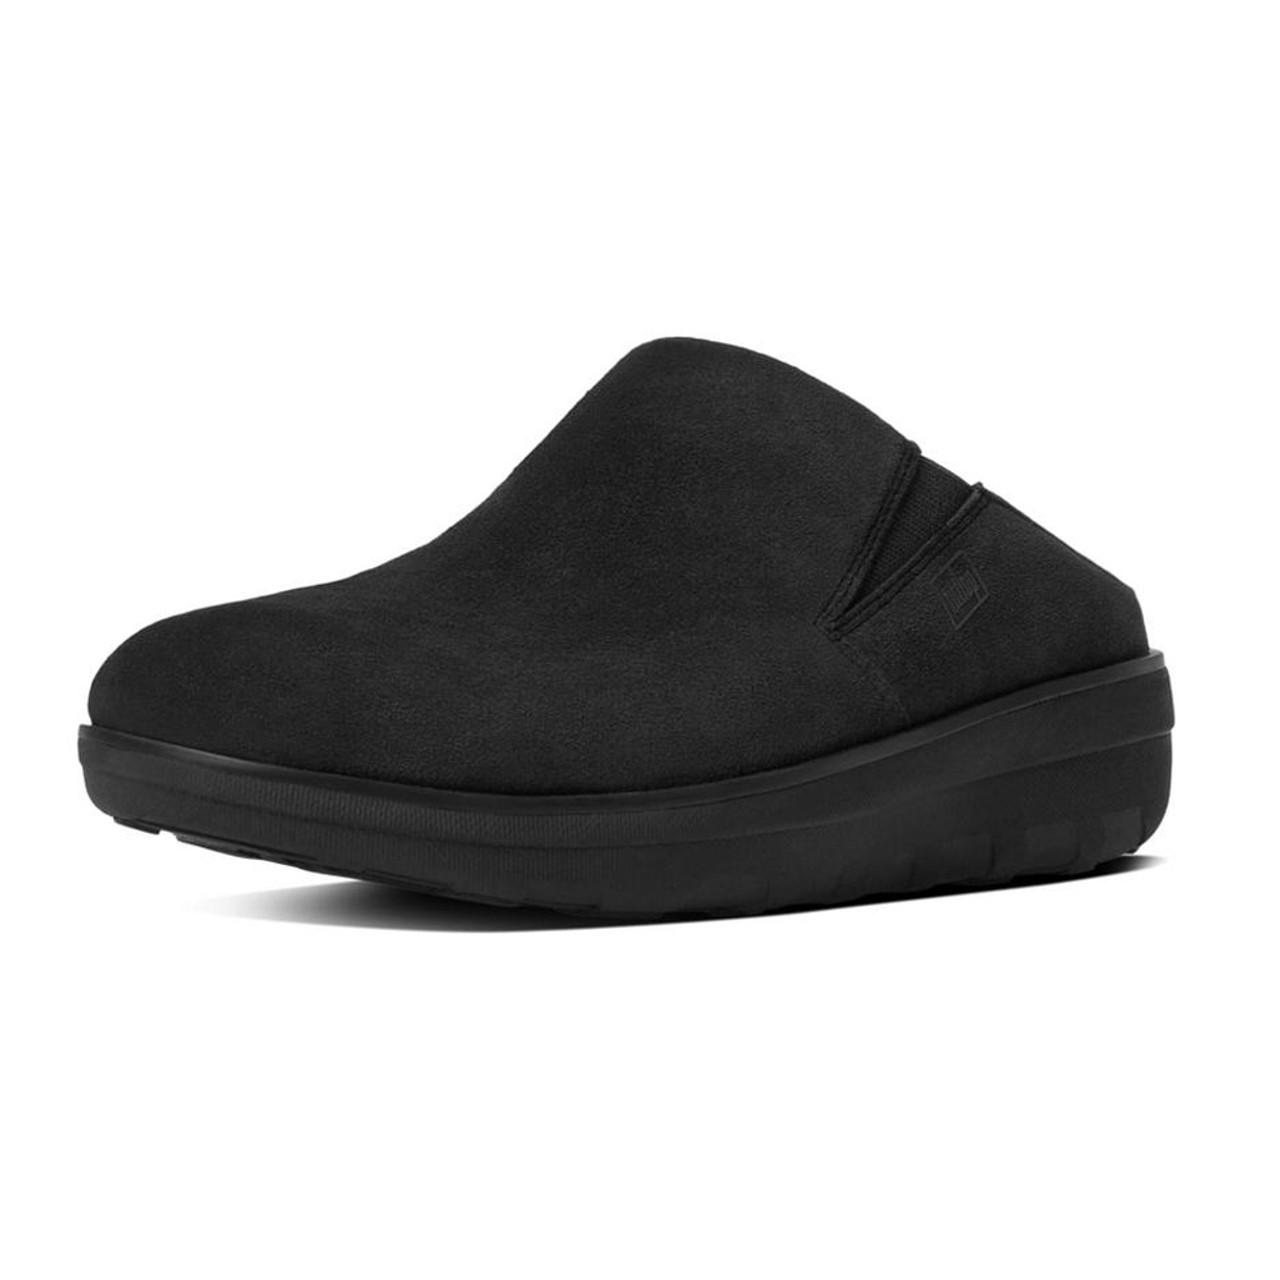 c070494ee Fitflop Women s Loaff Suede Clogs Black - Shop now   Shoolu.com